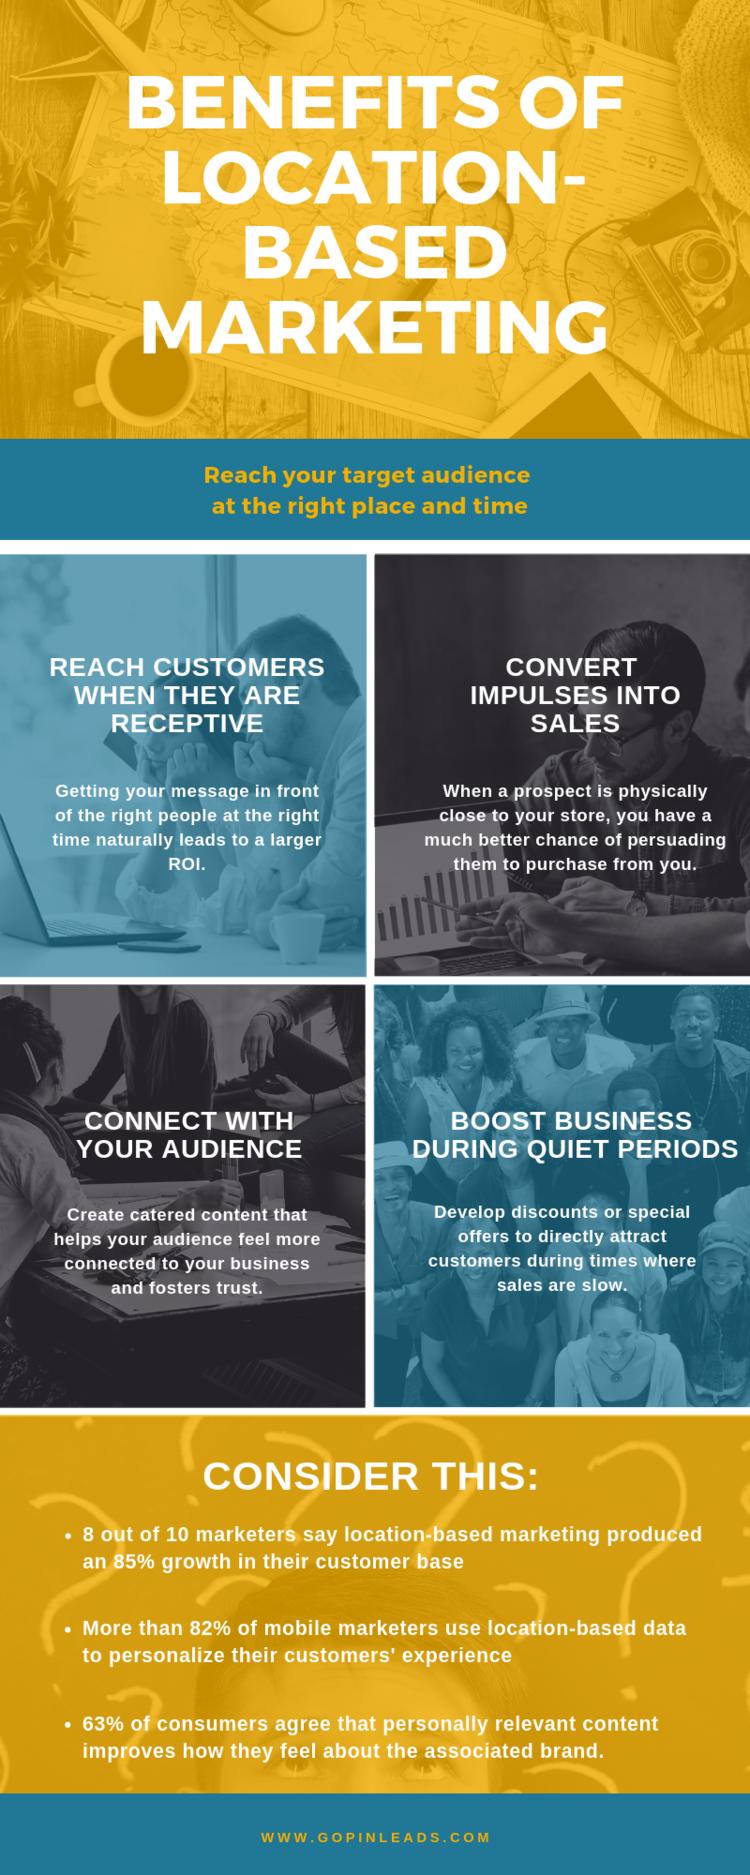 Benefits of location based marketing